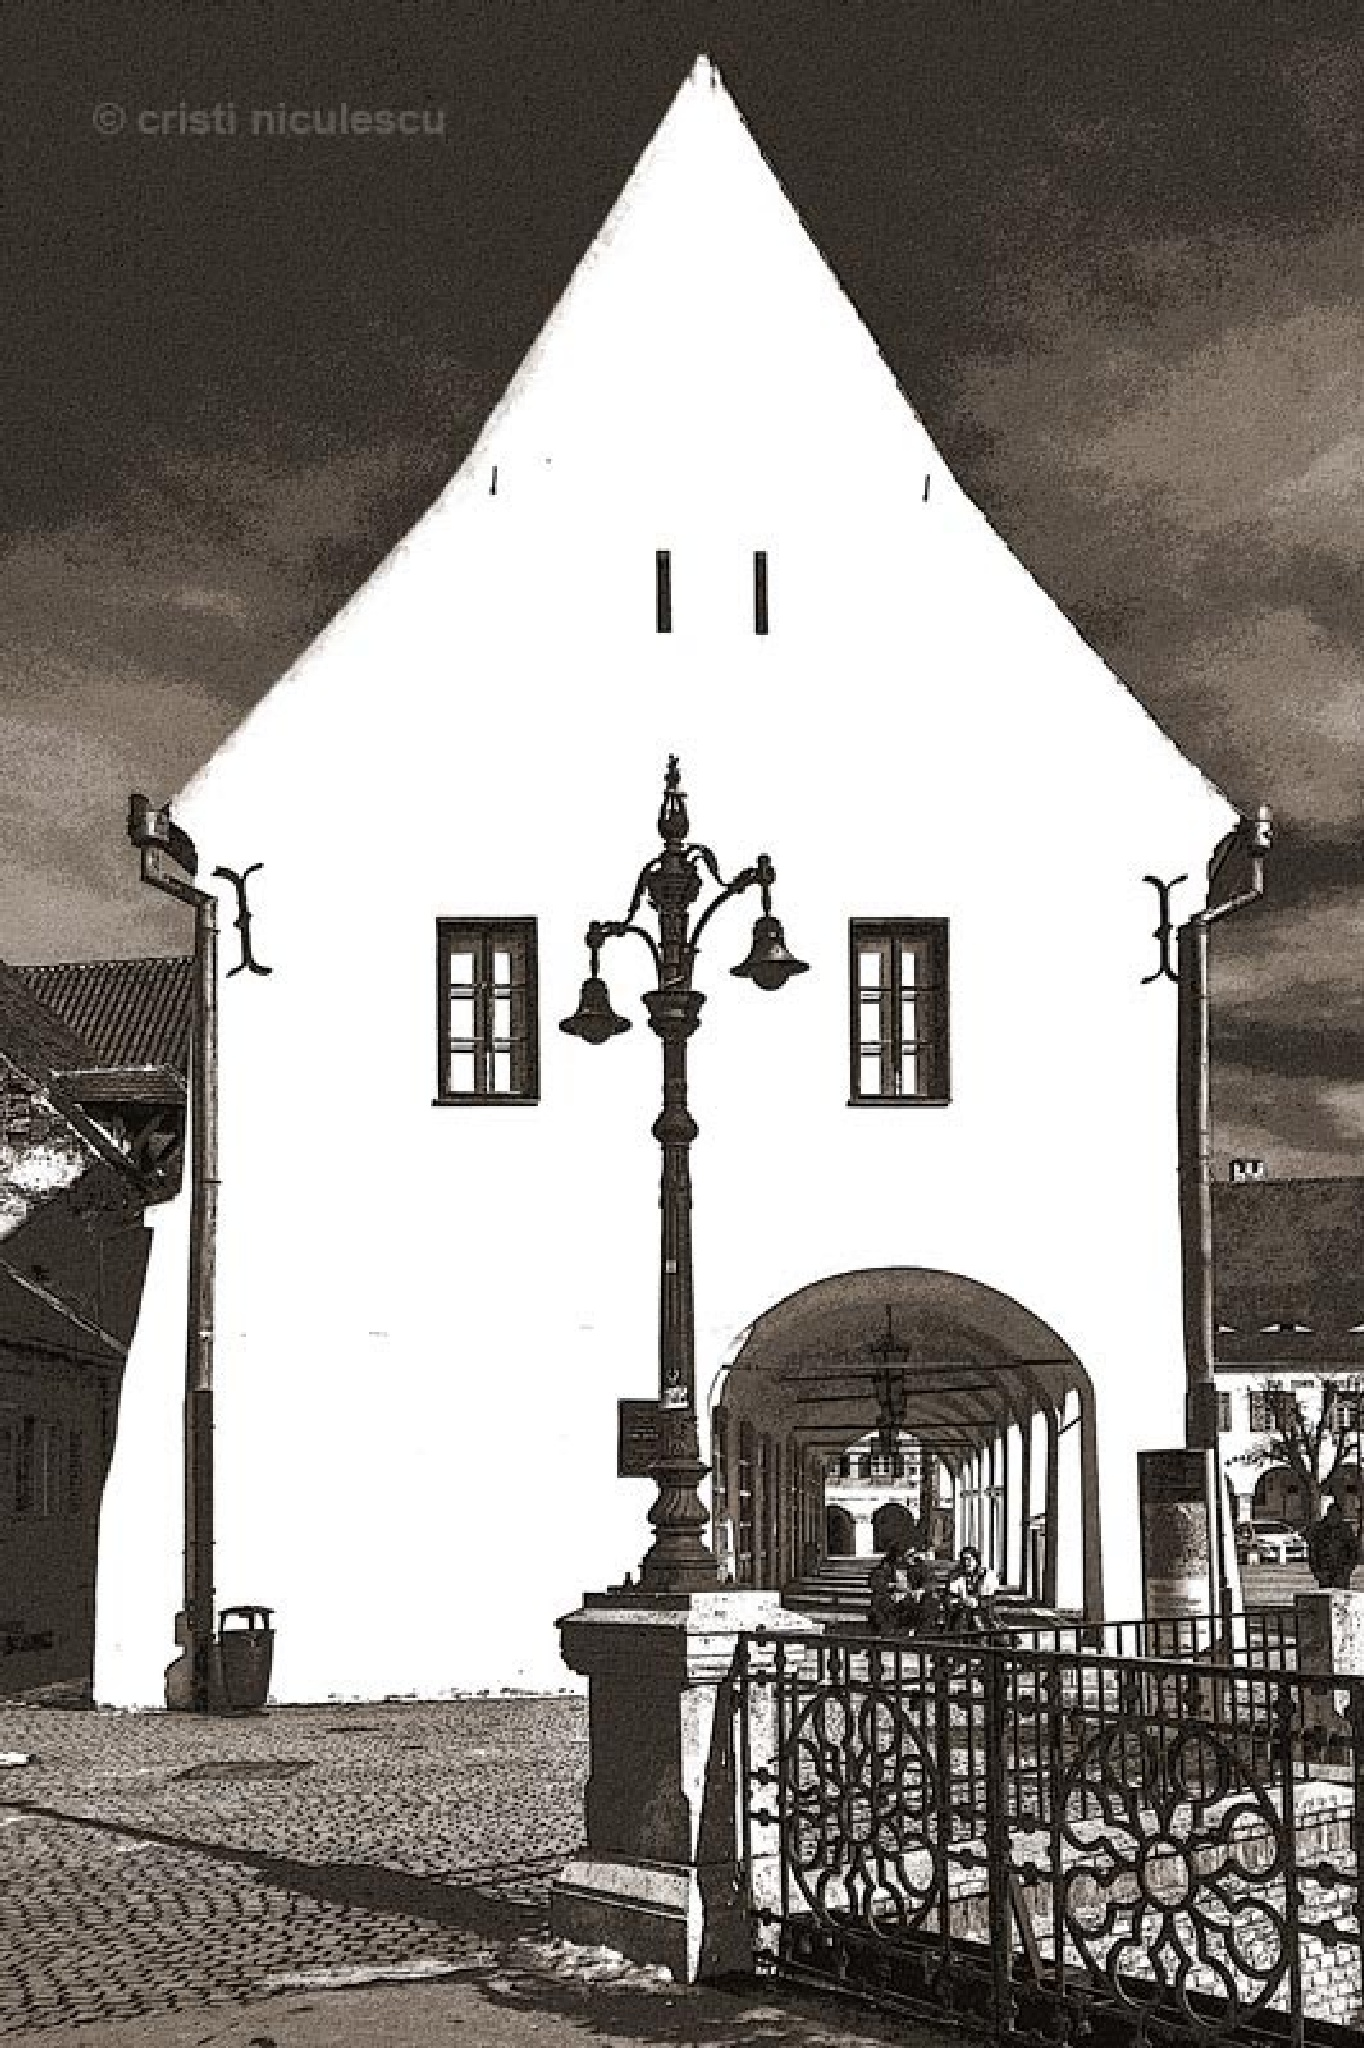 House of Arts by Cristi Niculescu